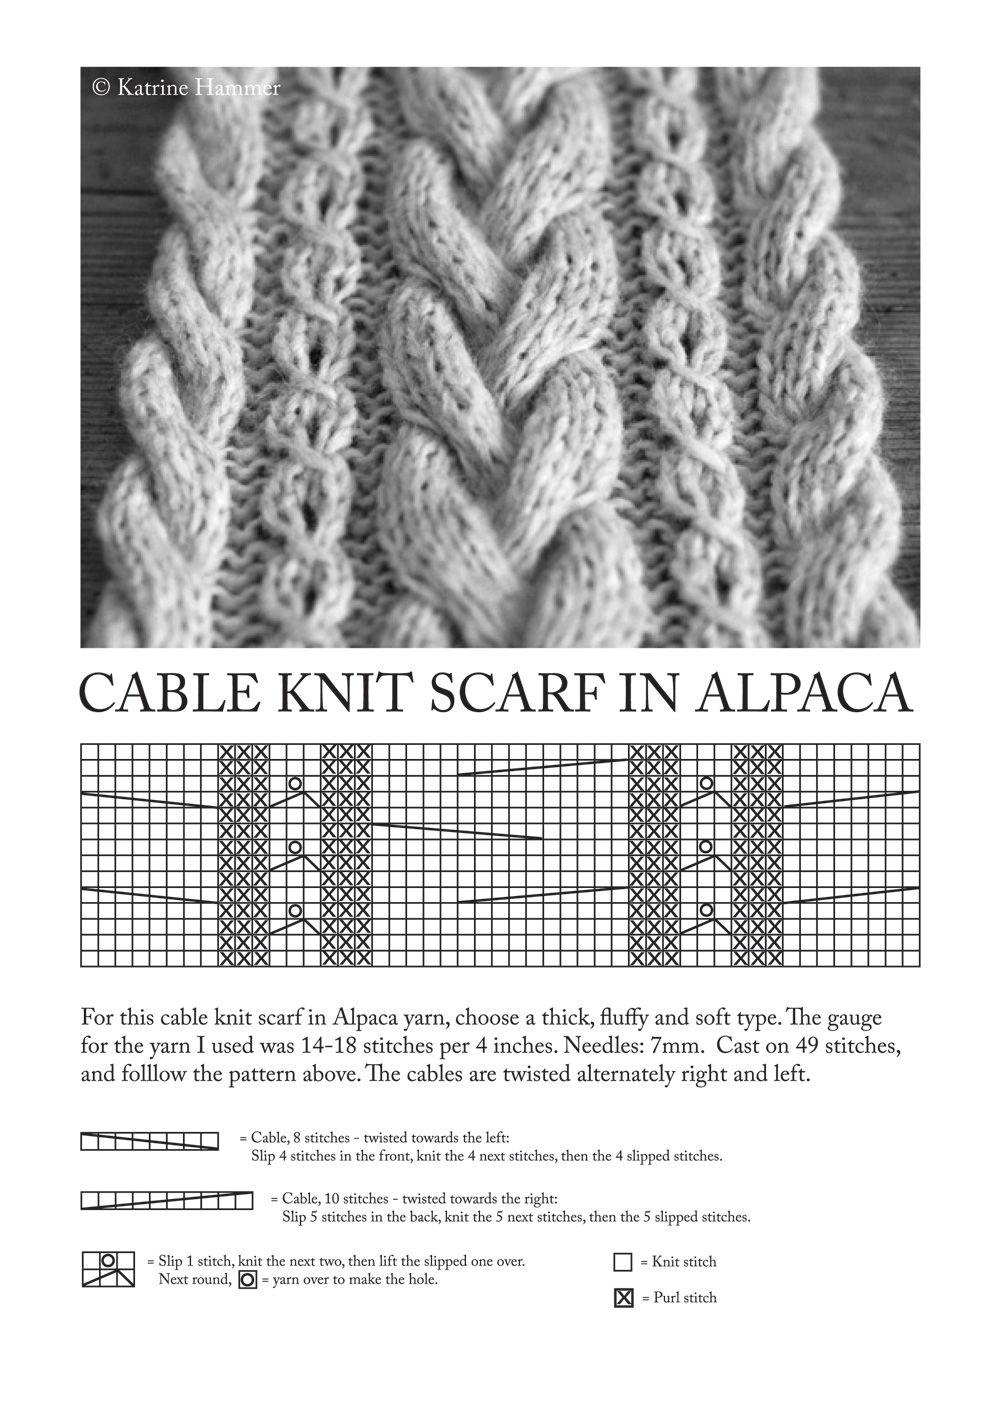 Magnificent Celtic Plait Cable Knitting Pattern Knit Stitches Pinterest Hairstyles For Women Draintrainus